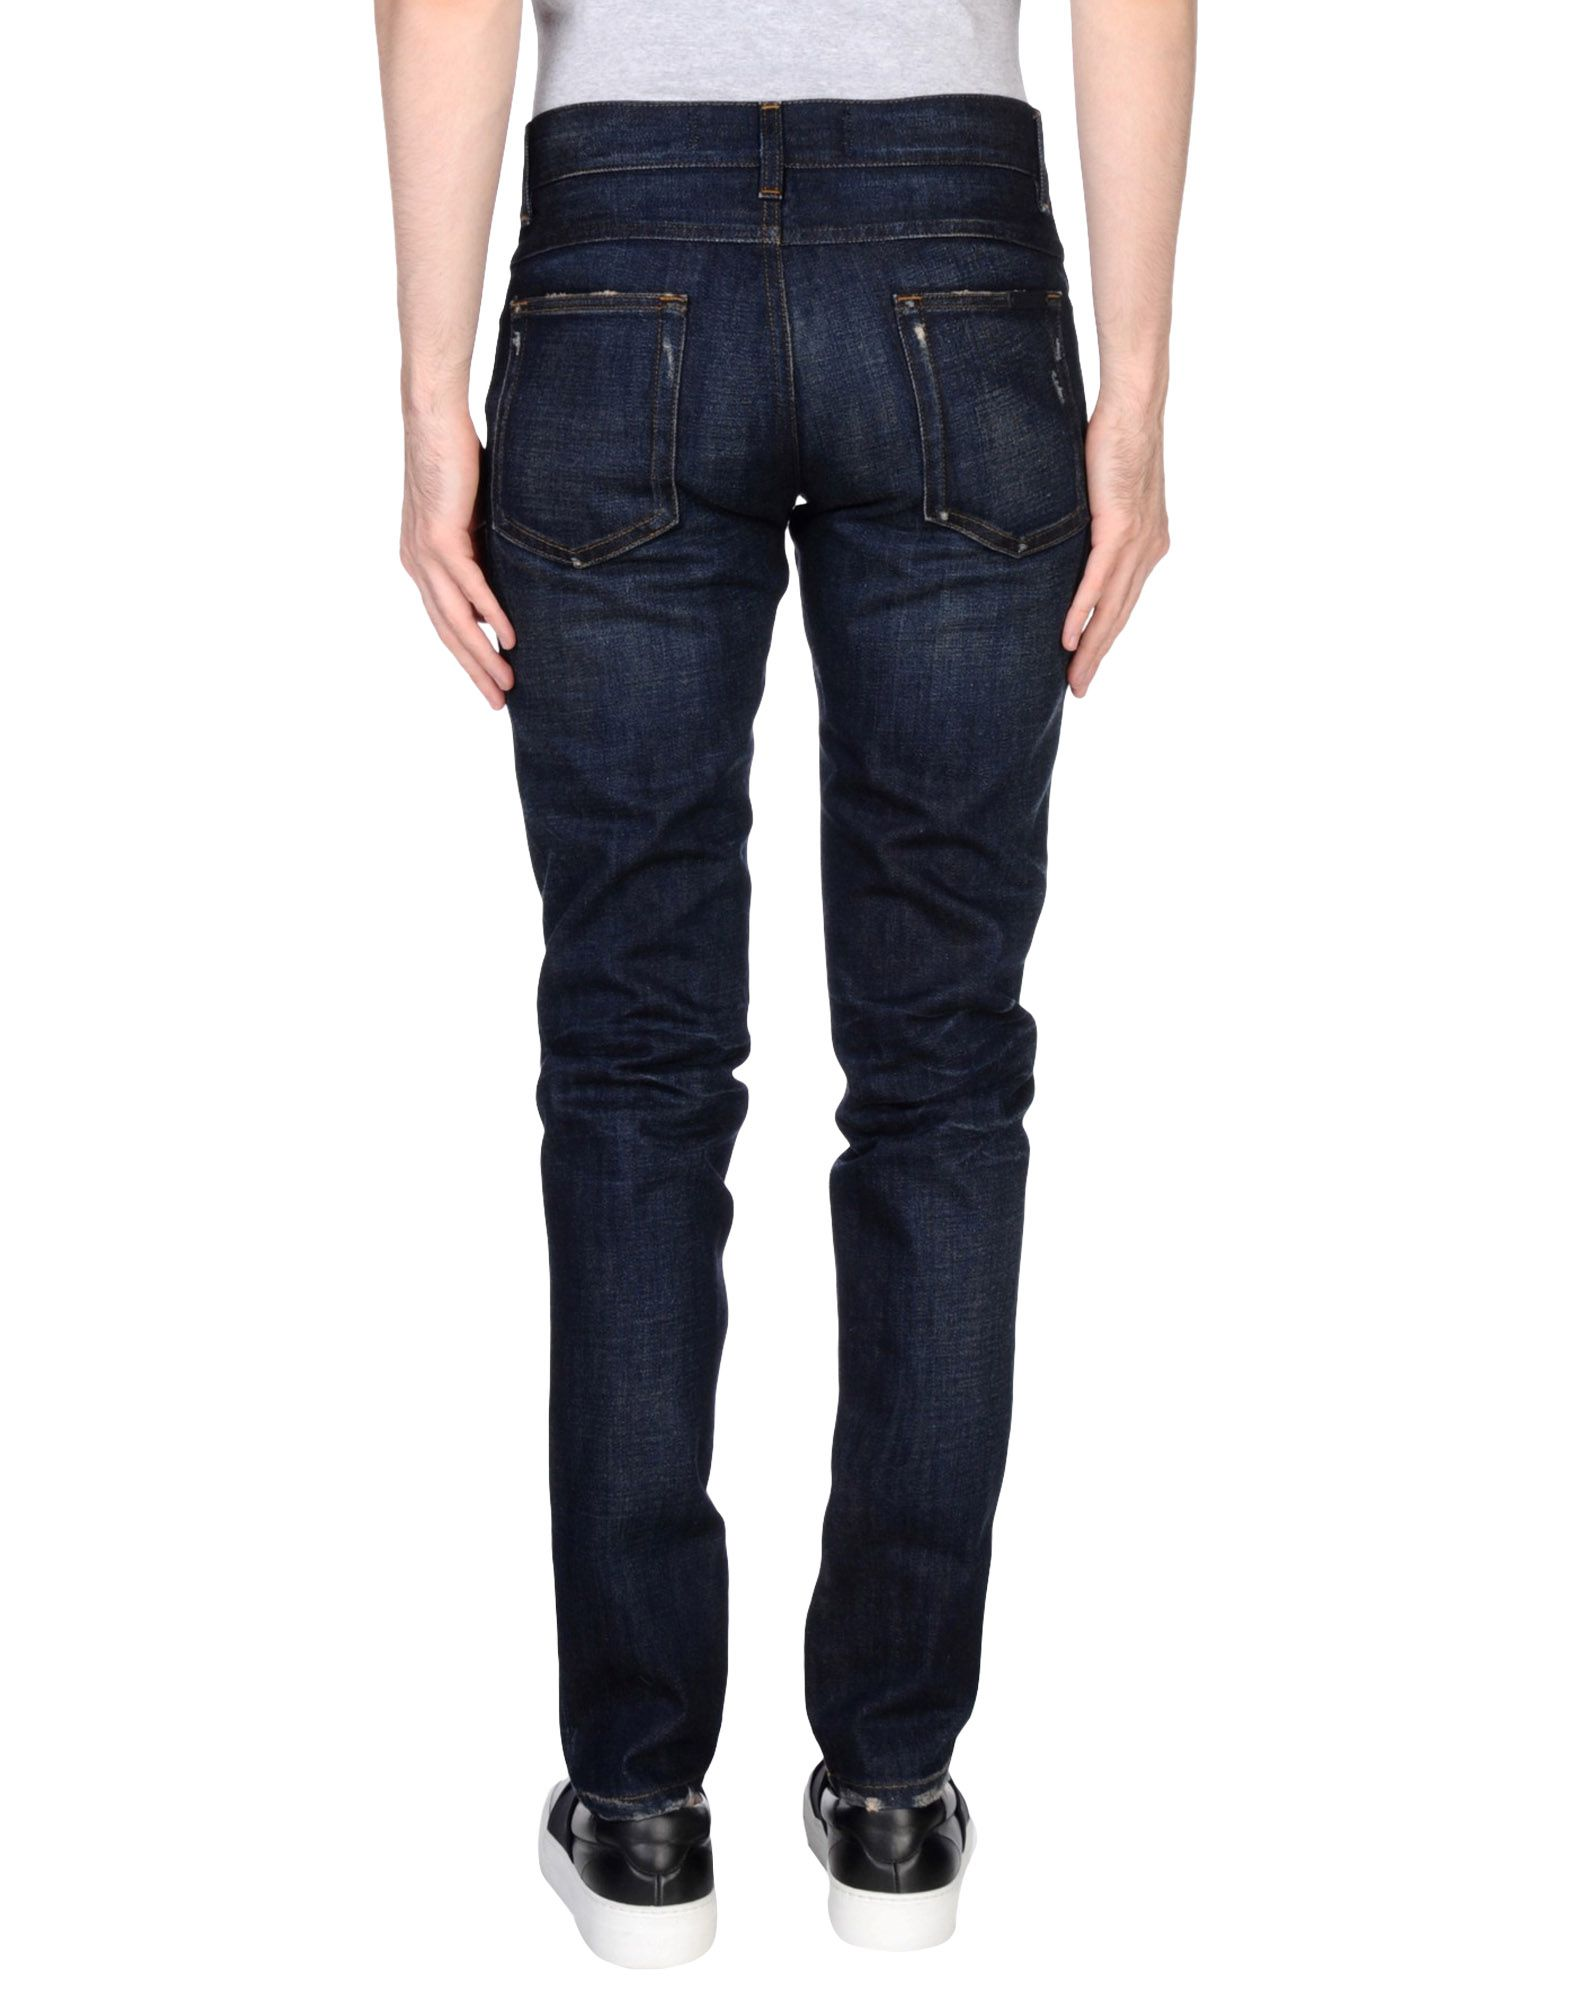 Pantaloni Pantaloni Pantaloni Jeans Dolce & Gabbana Uomo - 42633371XM f4f72a